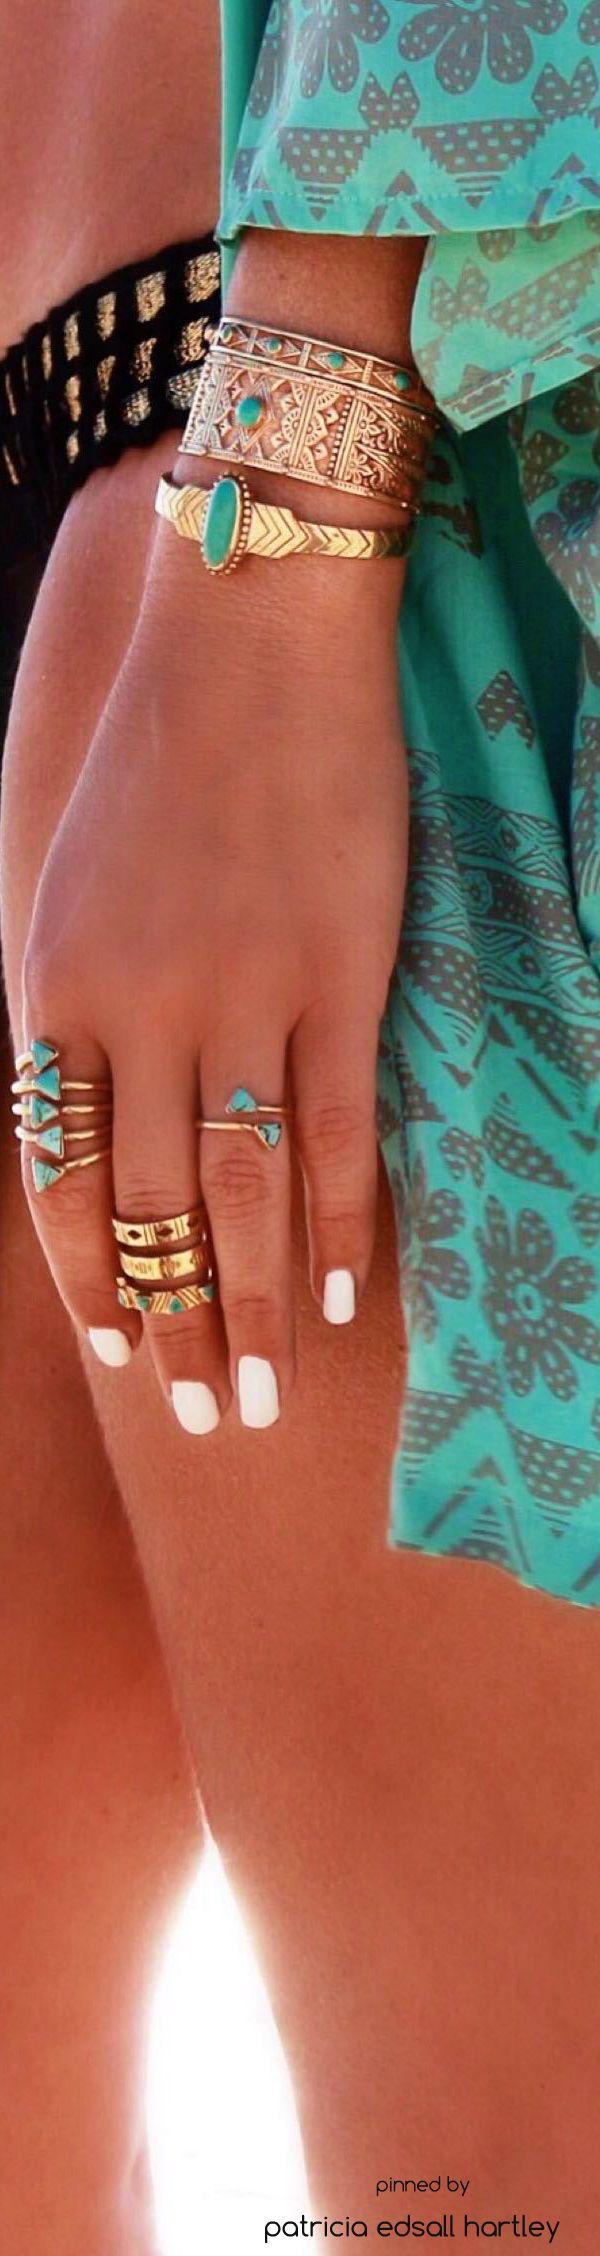 Ohhhh myyyy accessories pinterest boho turquoise nail polish